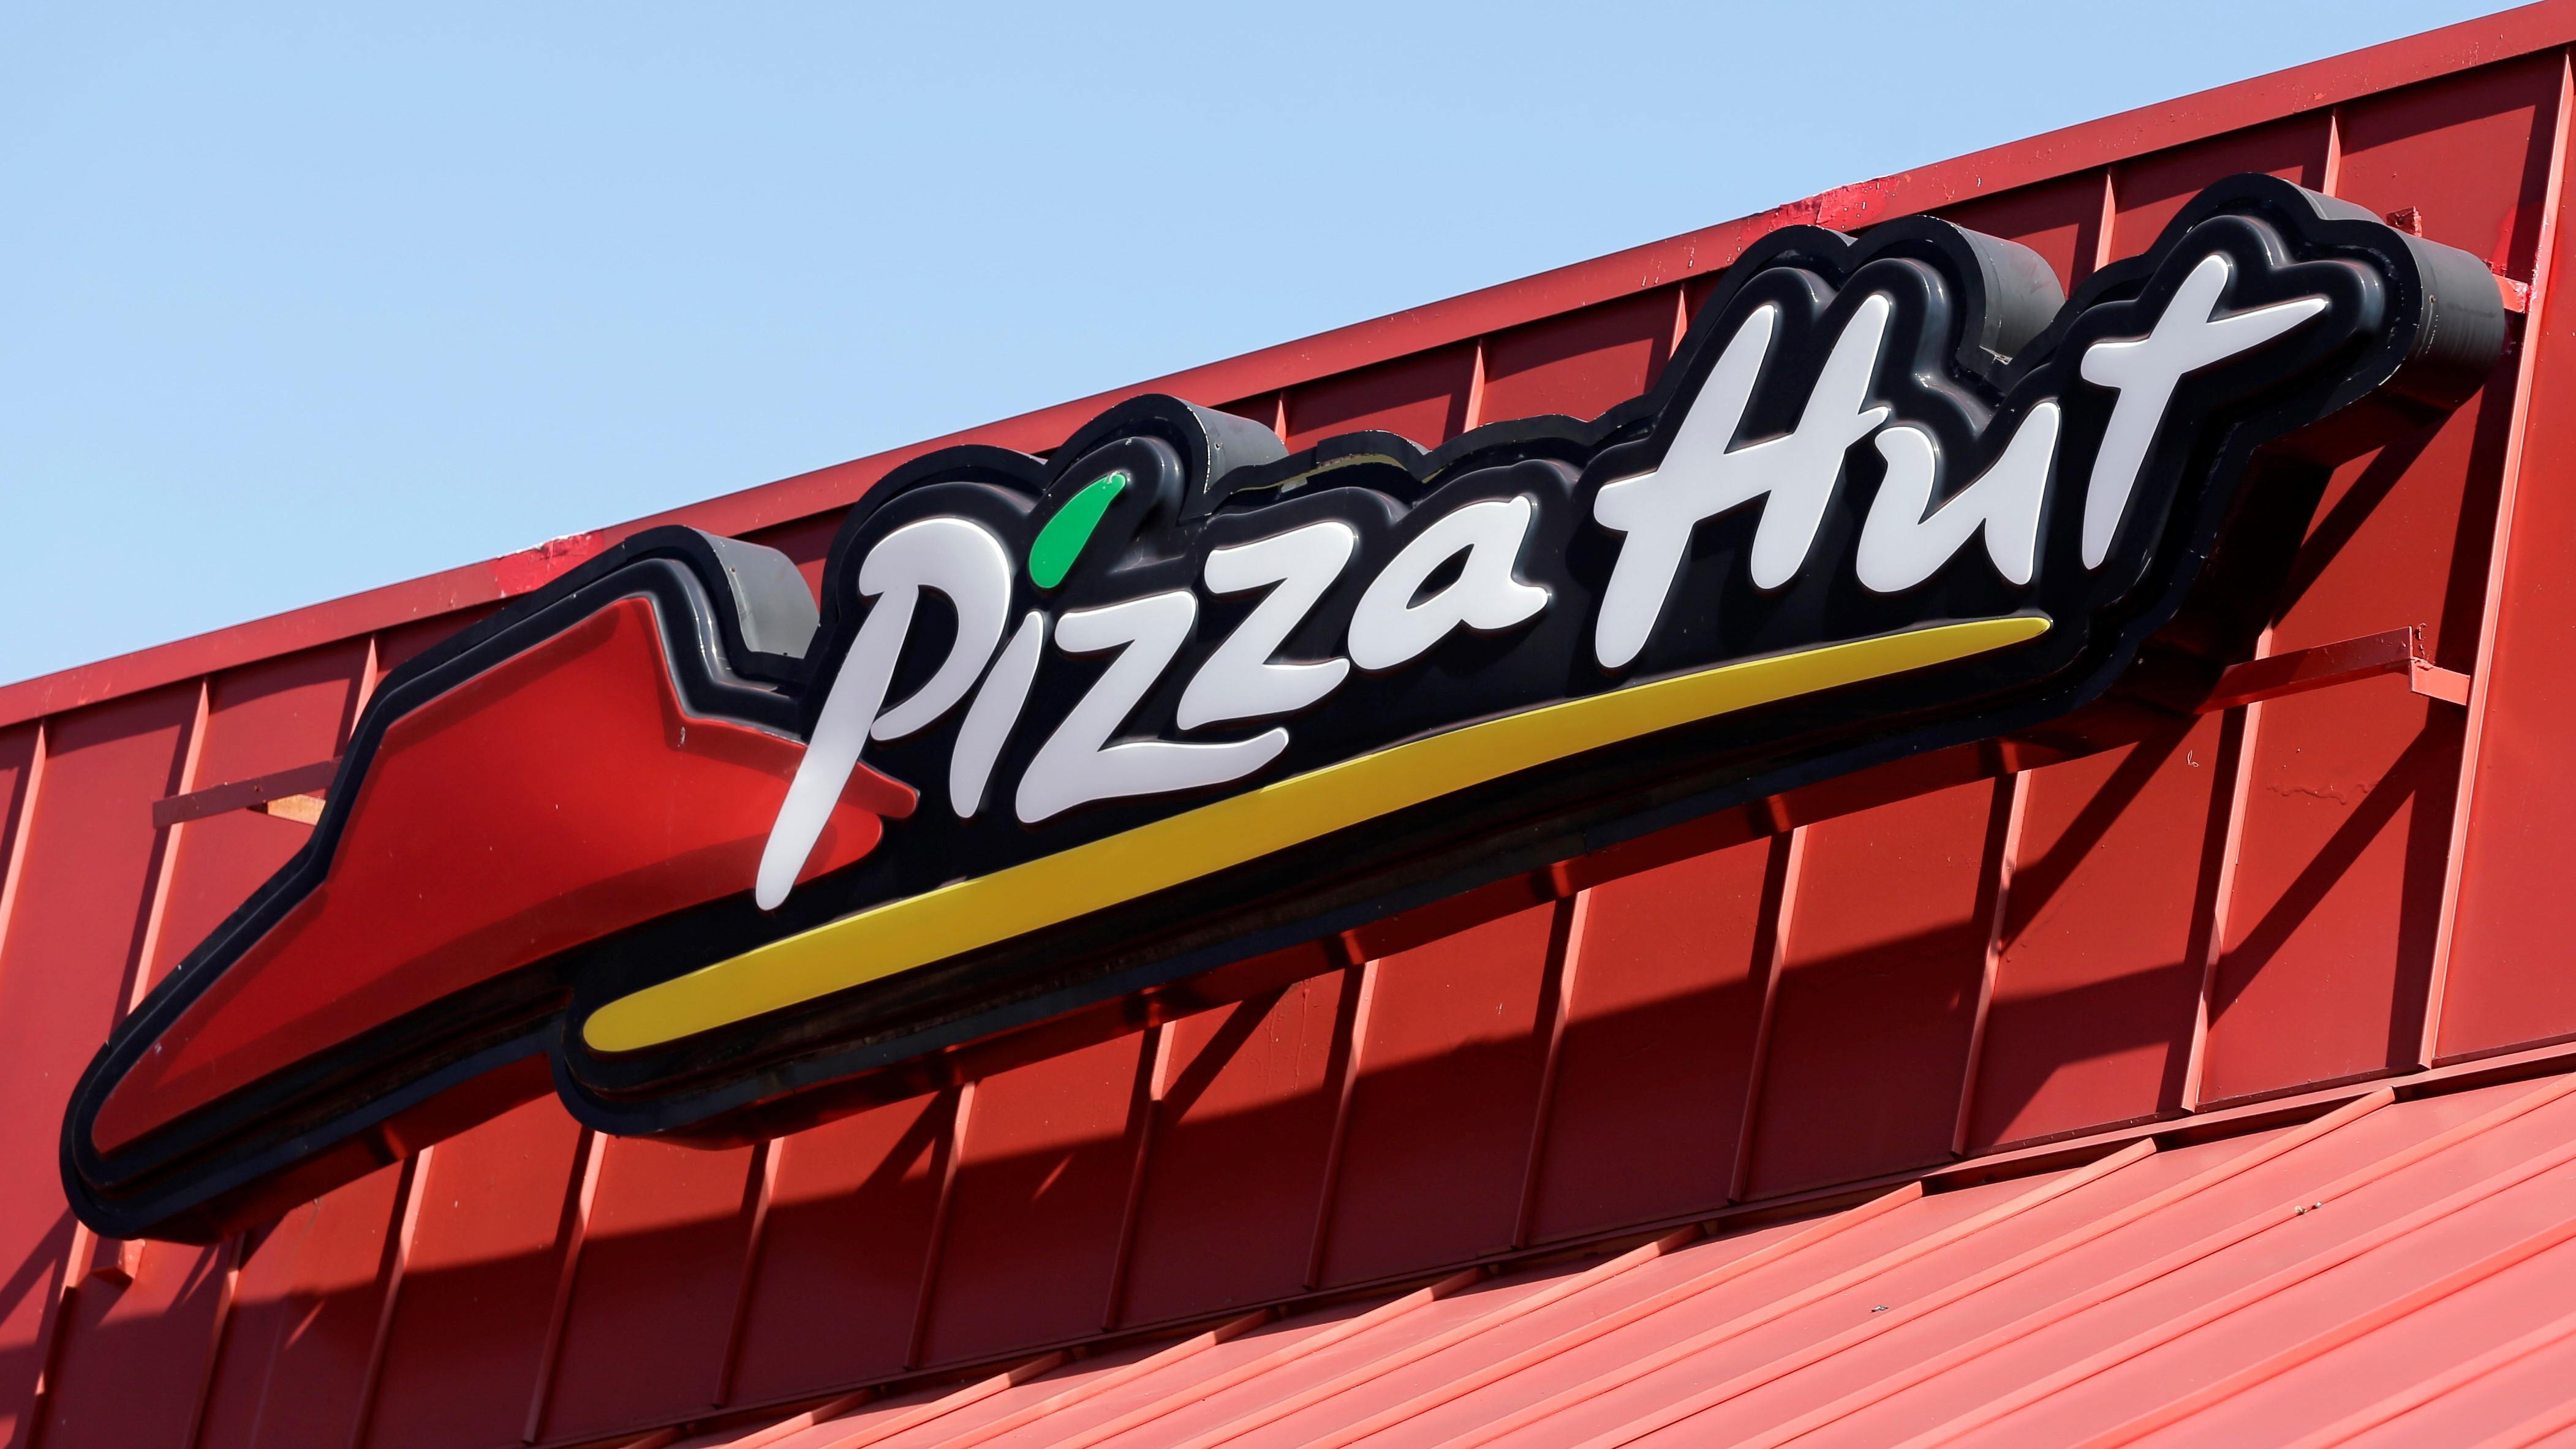 2020 Grads Can Get Free Pizza Hut Pizza Abc13 Houston